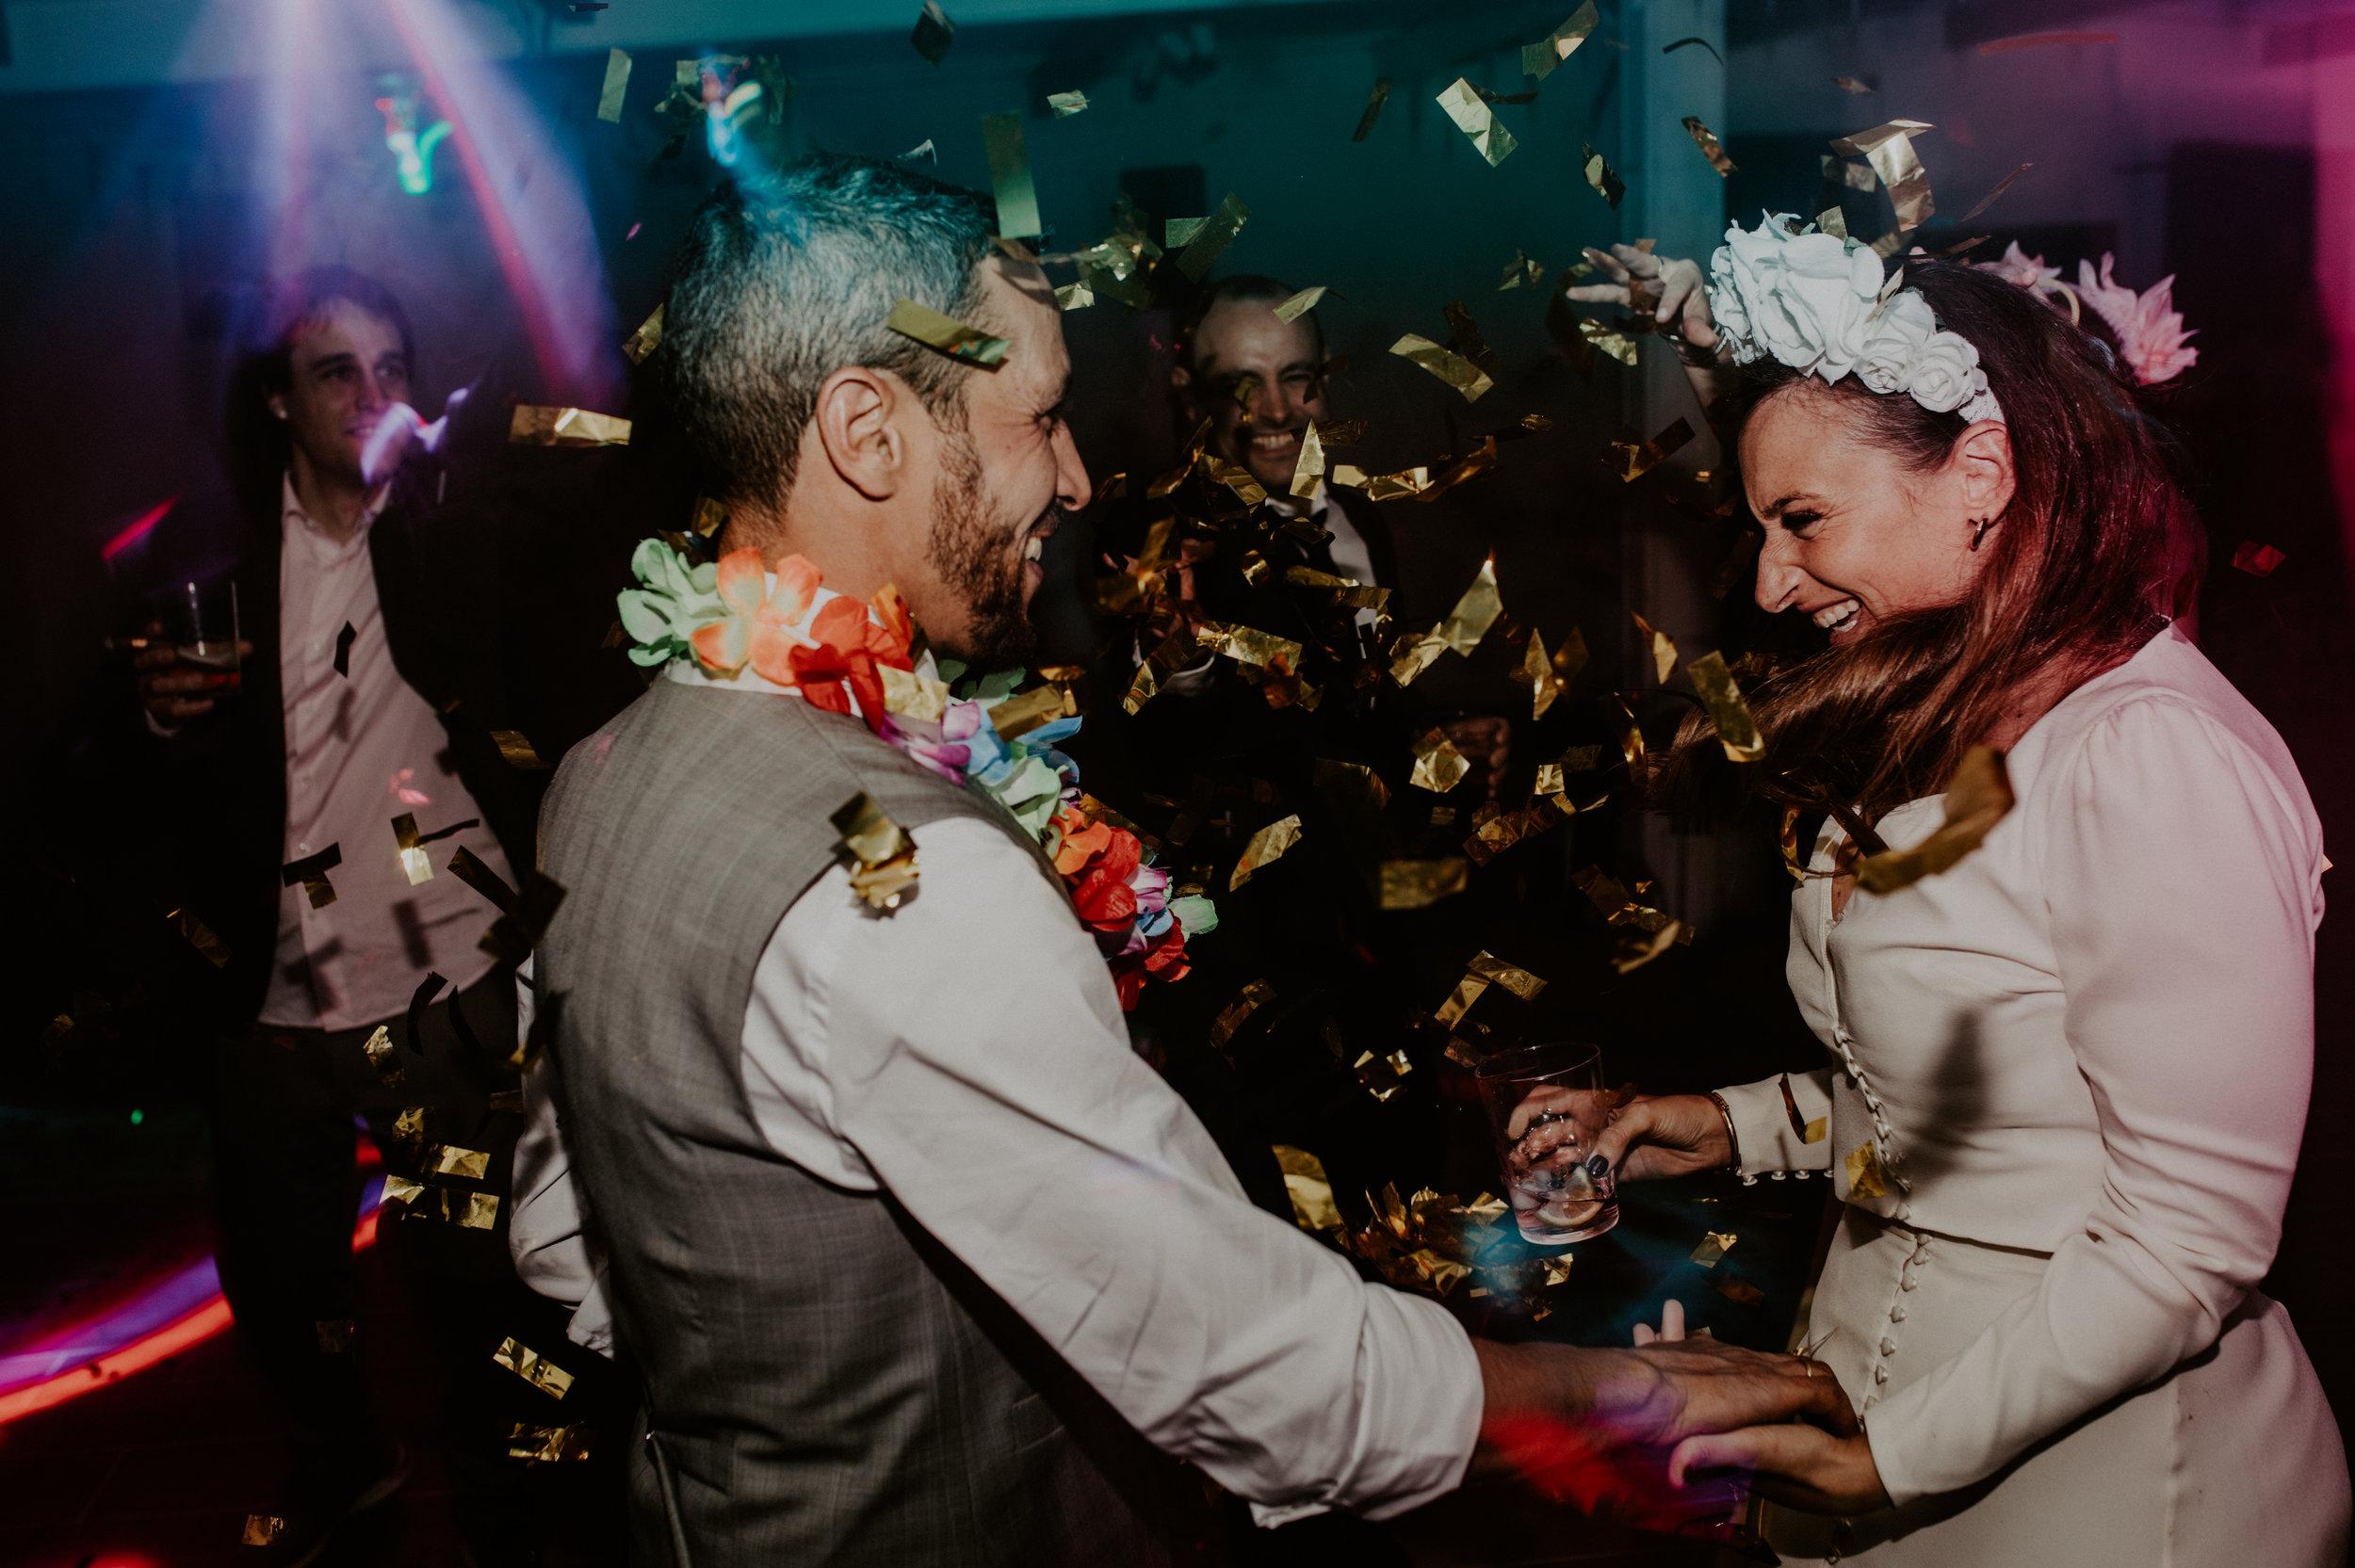 thenortherngirlphotography-fotografa-de-bodas-barcelona_destinartion-wedding-photographer_wedding-photographer_moroccan-wedding_HADNANANTIGONA-1605.jpg